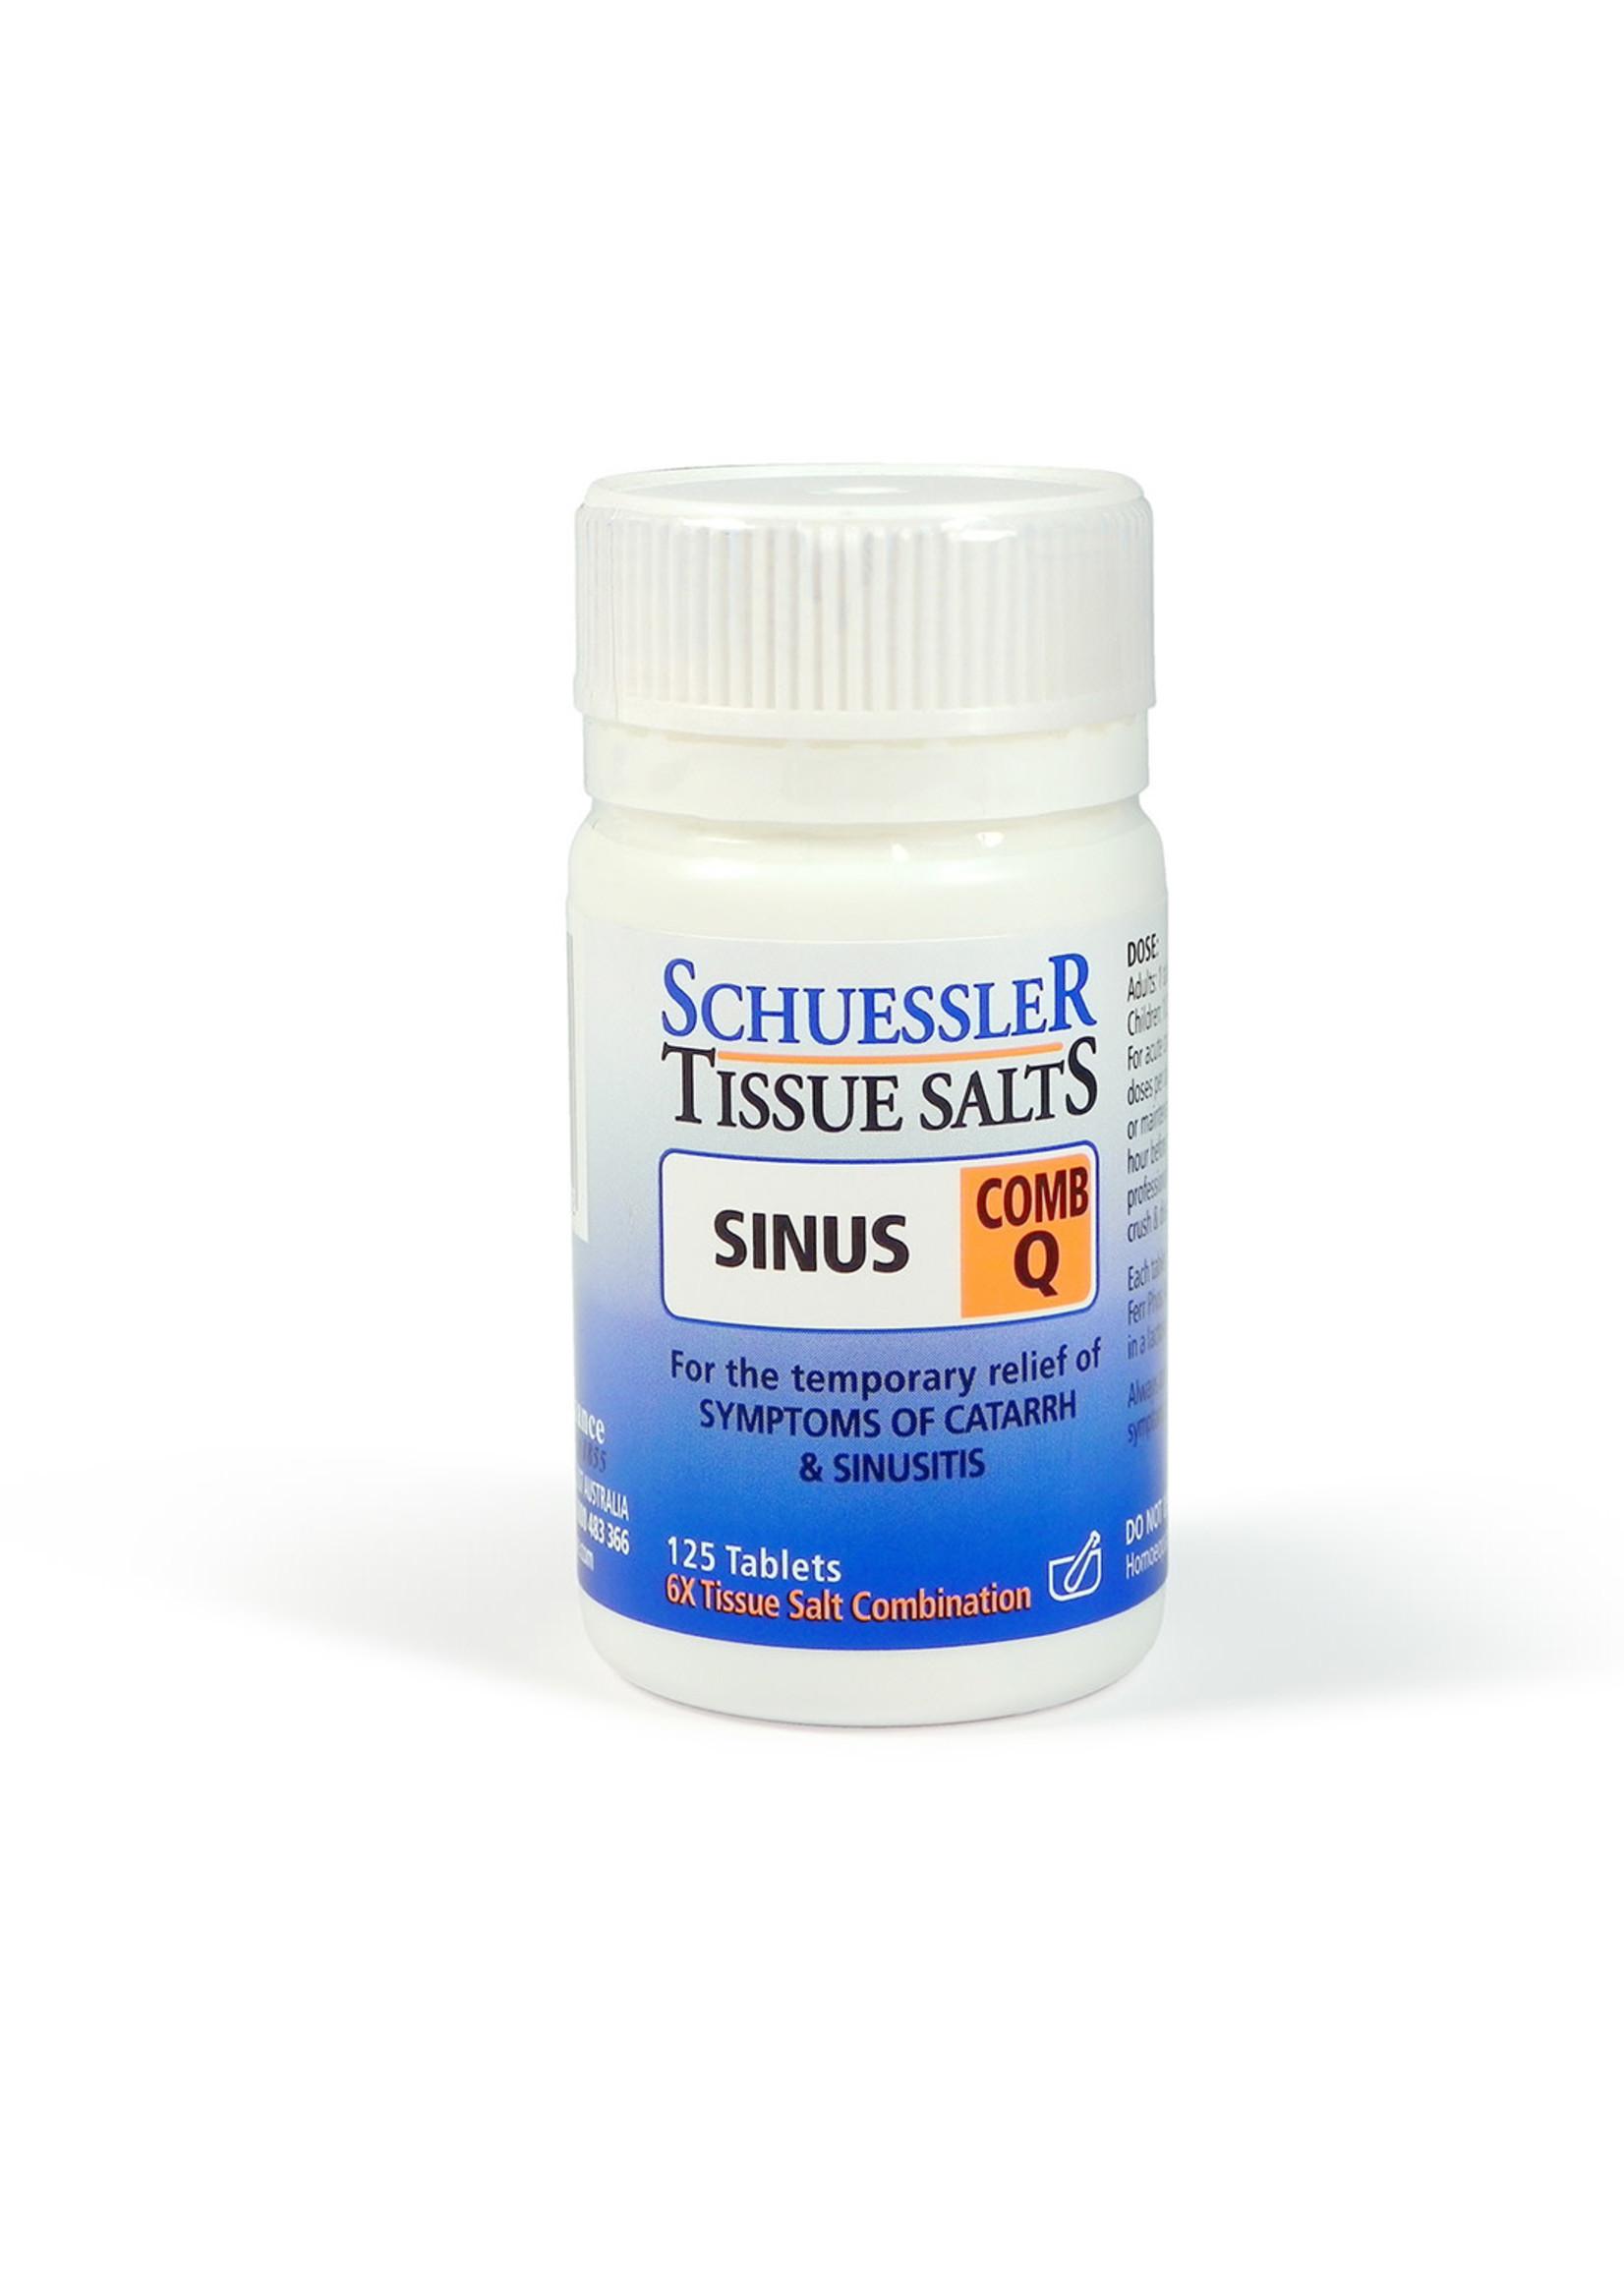 Martin & Pleasance Martin & Pleasance Schuessler Tissue Salts Comb Q 125 Tab